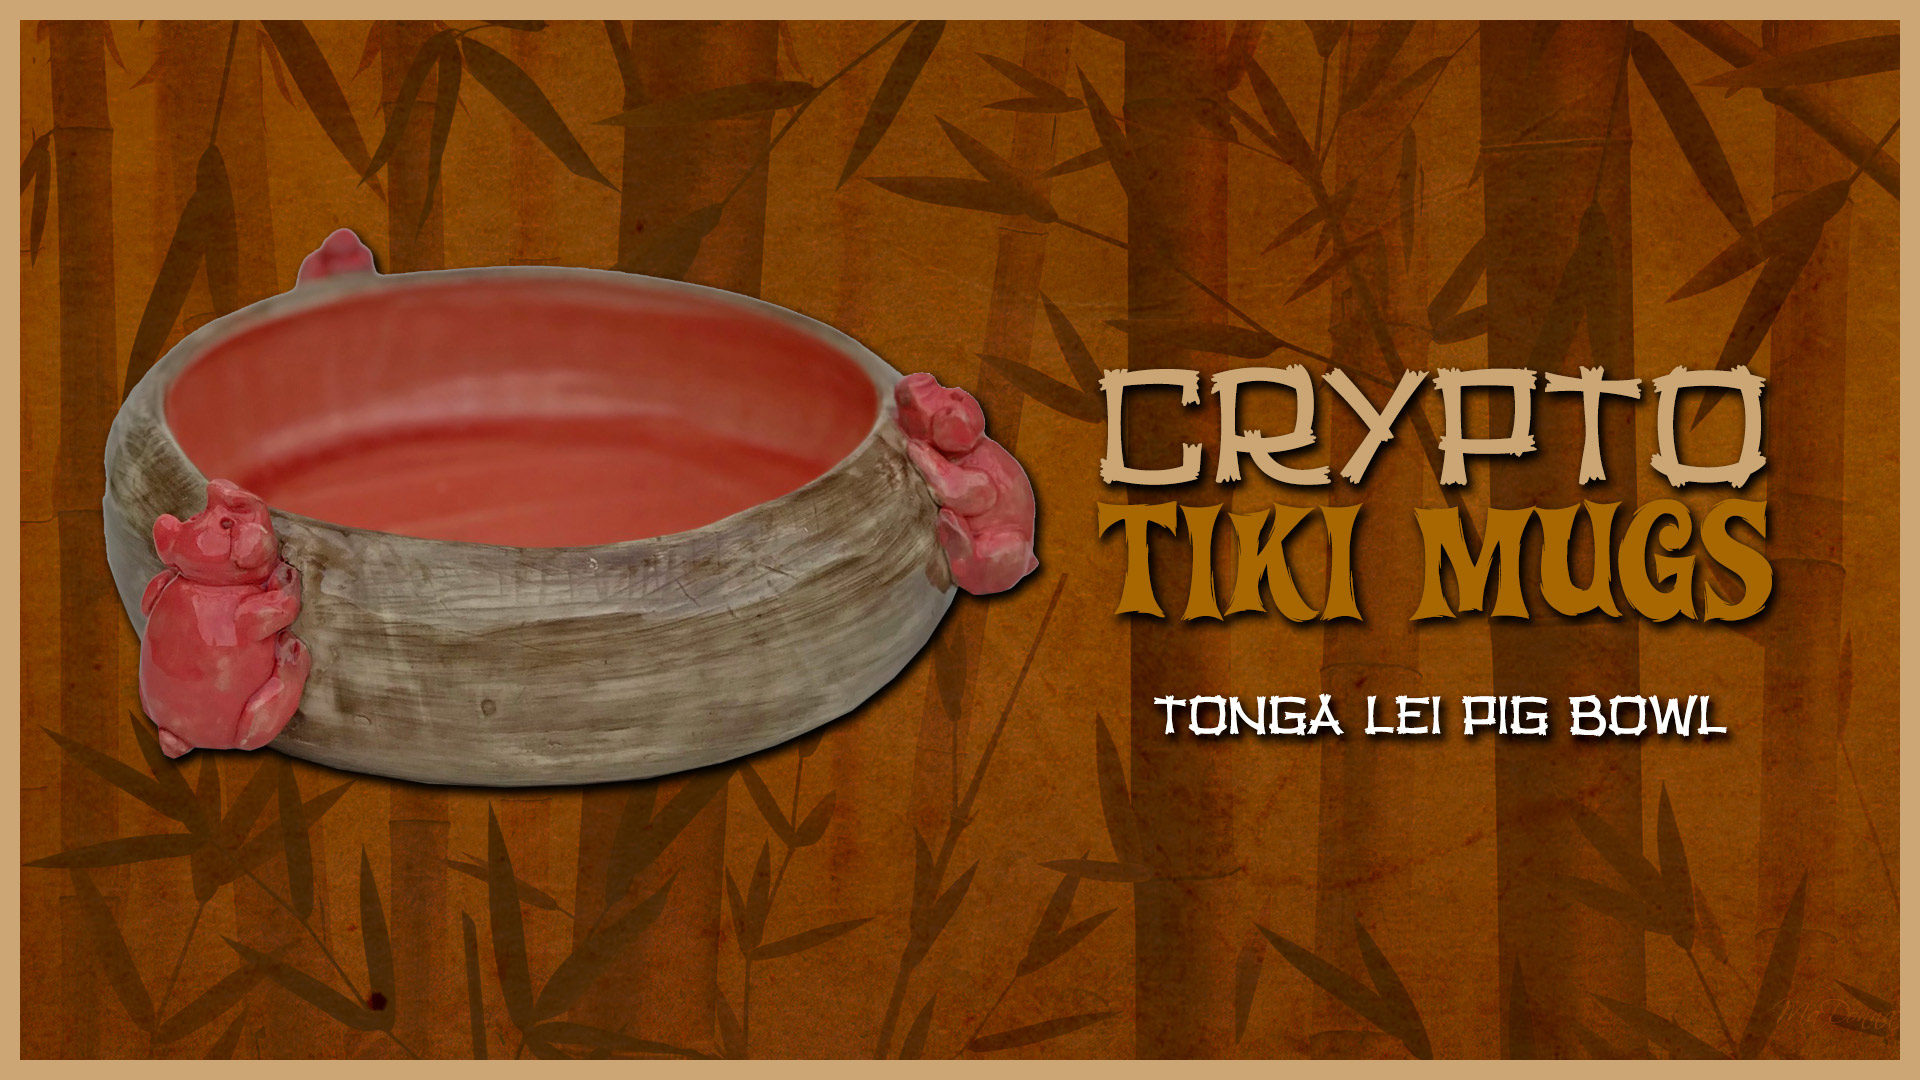 Tonga Lei Pig Bowl